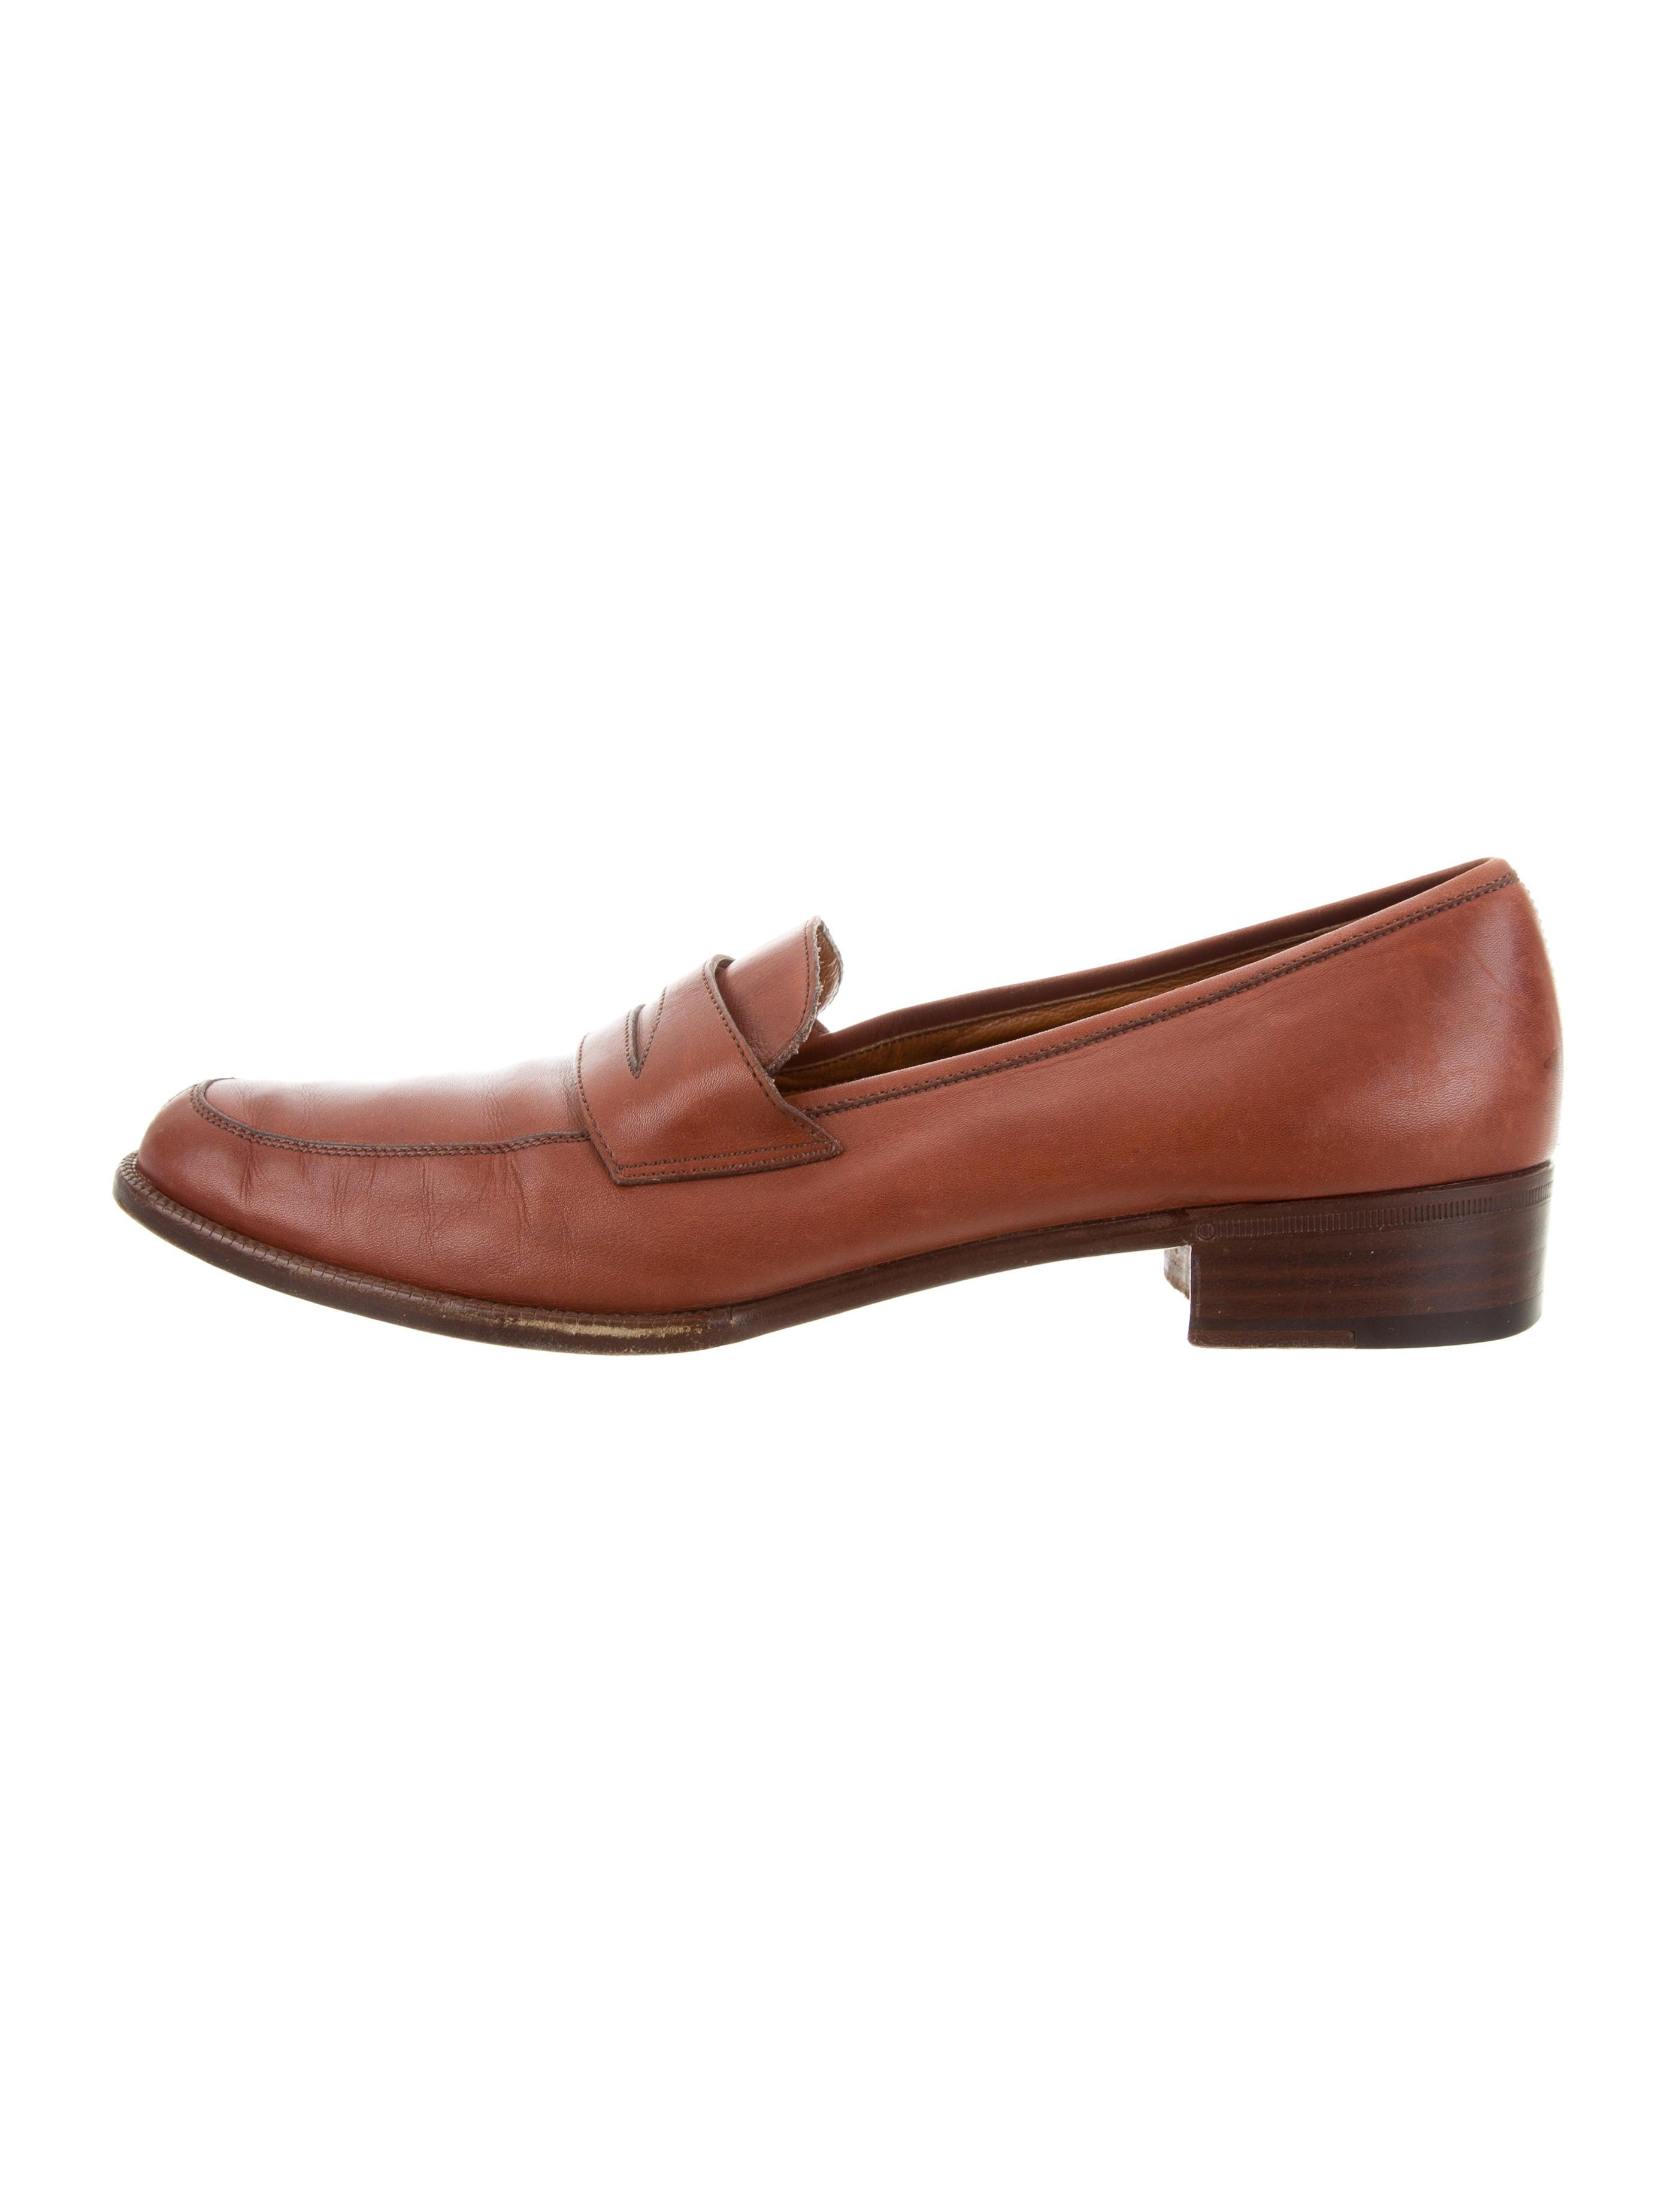 Salvatore Ferragamo Round-Toe Leather Loafers free shipping popular NRomWGIv